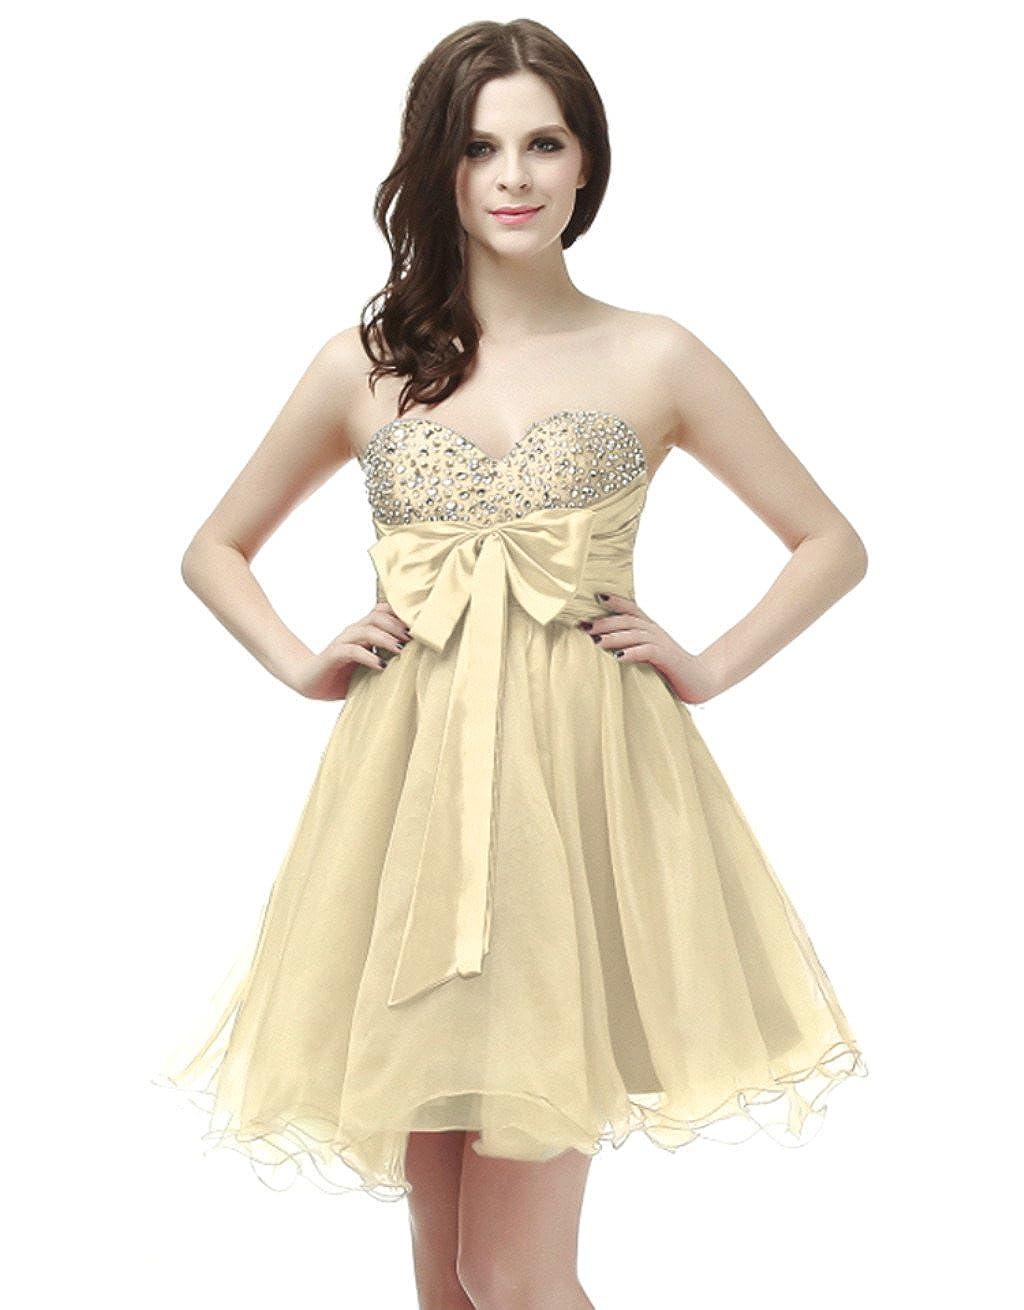 Champagne Vantexi Women's Organza Short Beaded Homecoming Dress Prom Gown